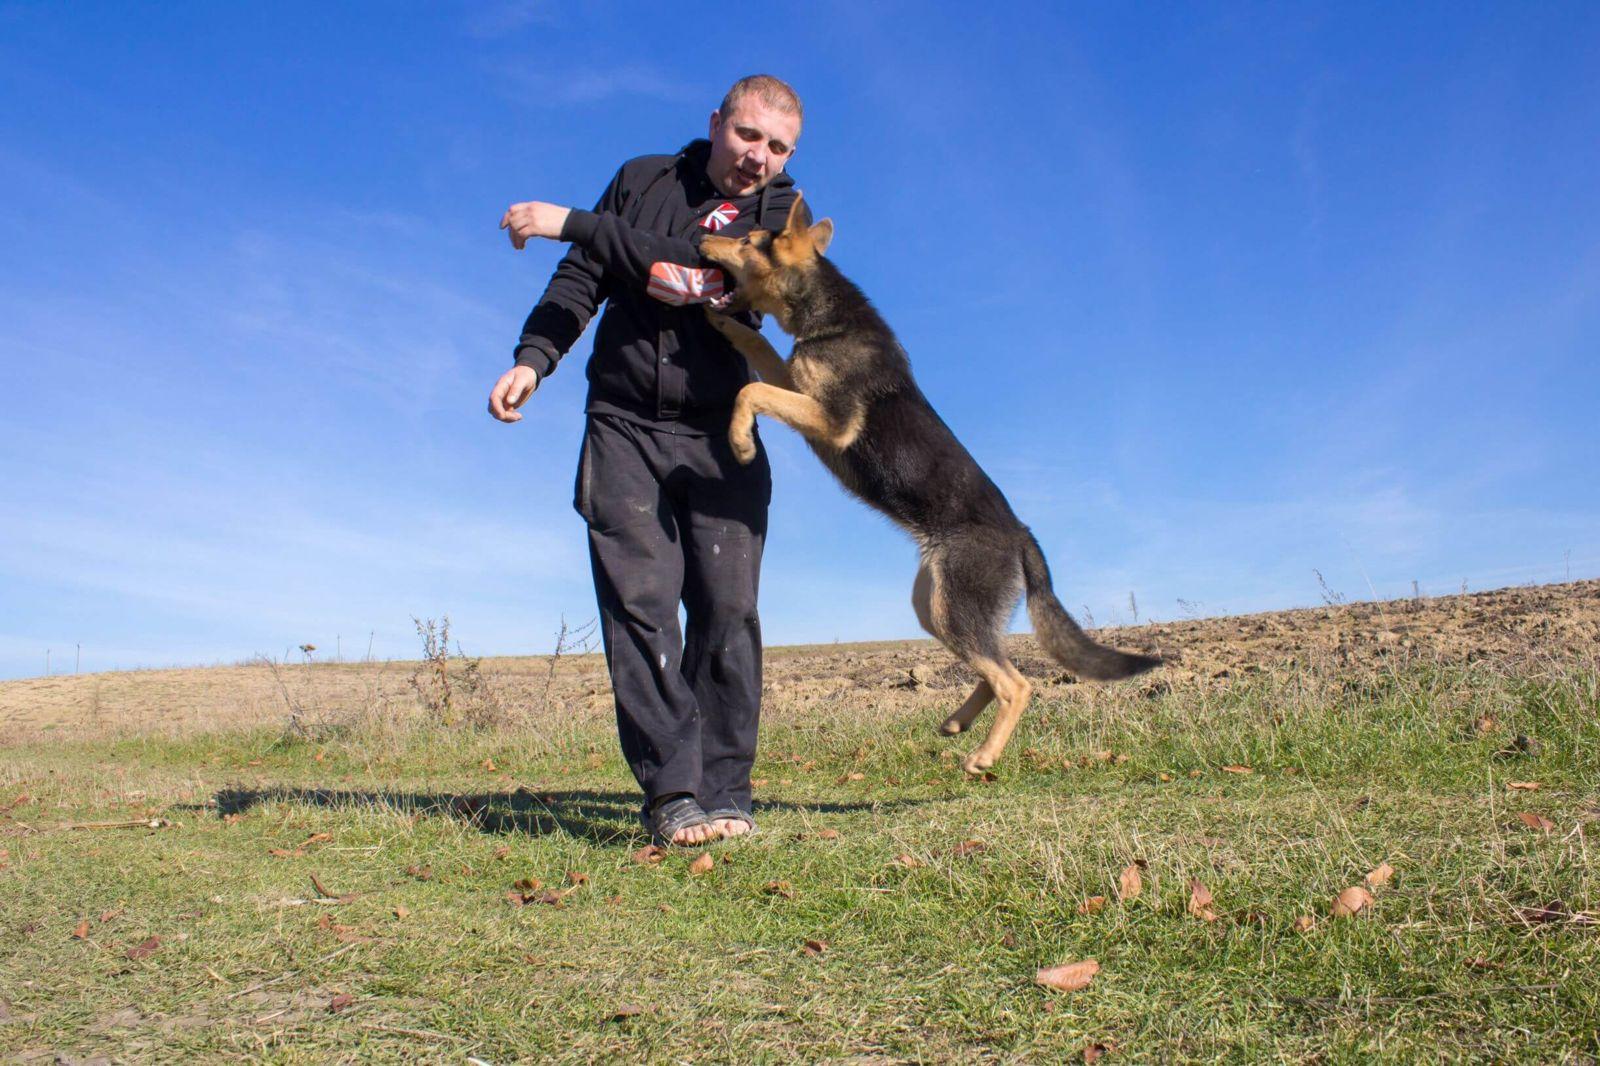 Dog biting a man's arm